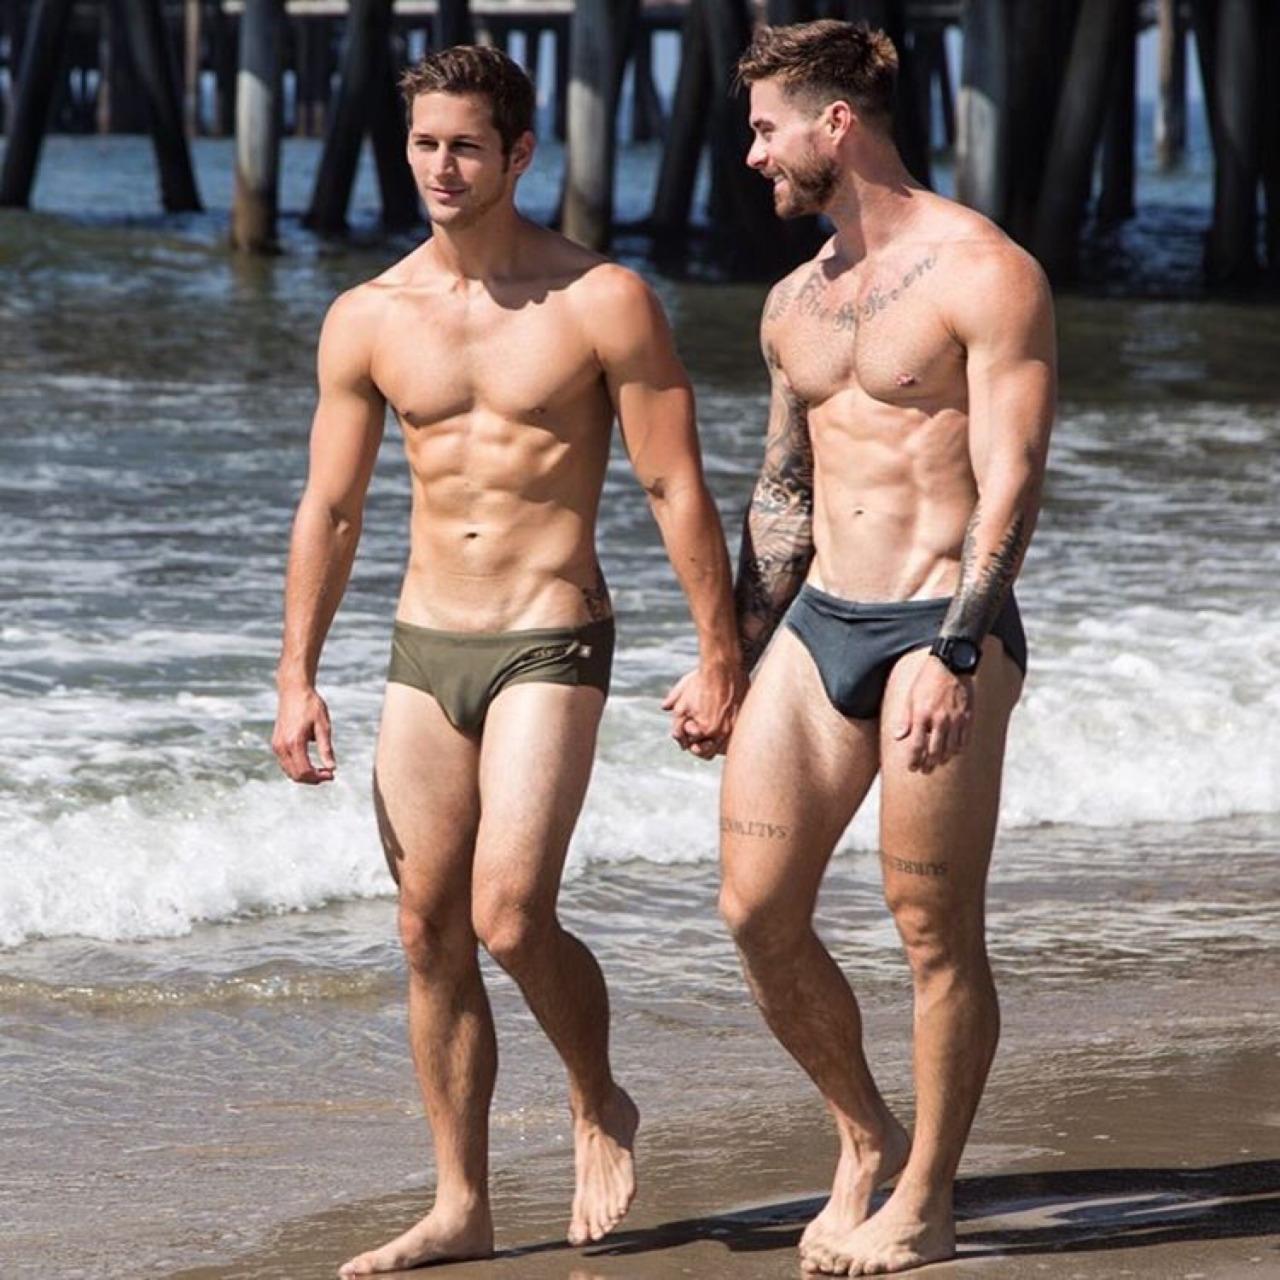 Gay guys in traverse city michigan